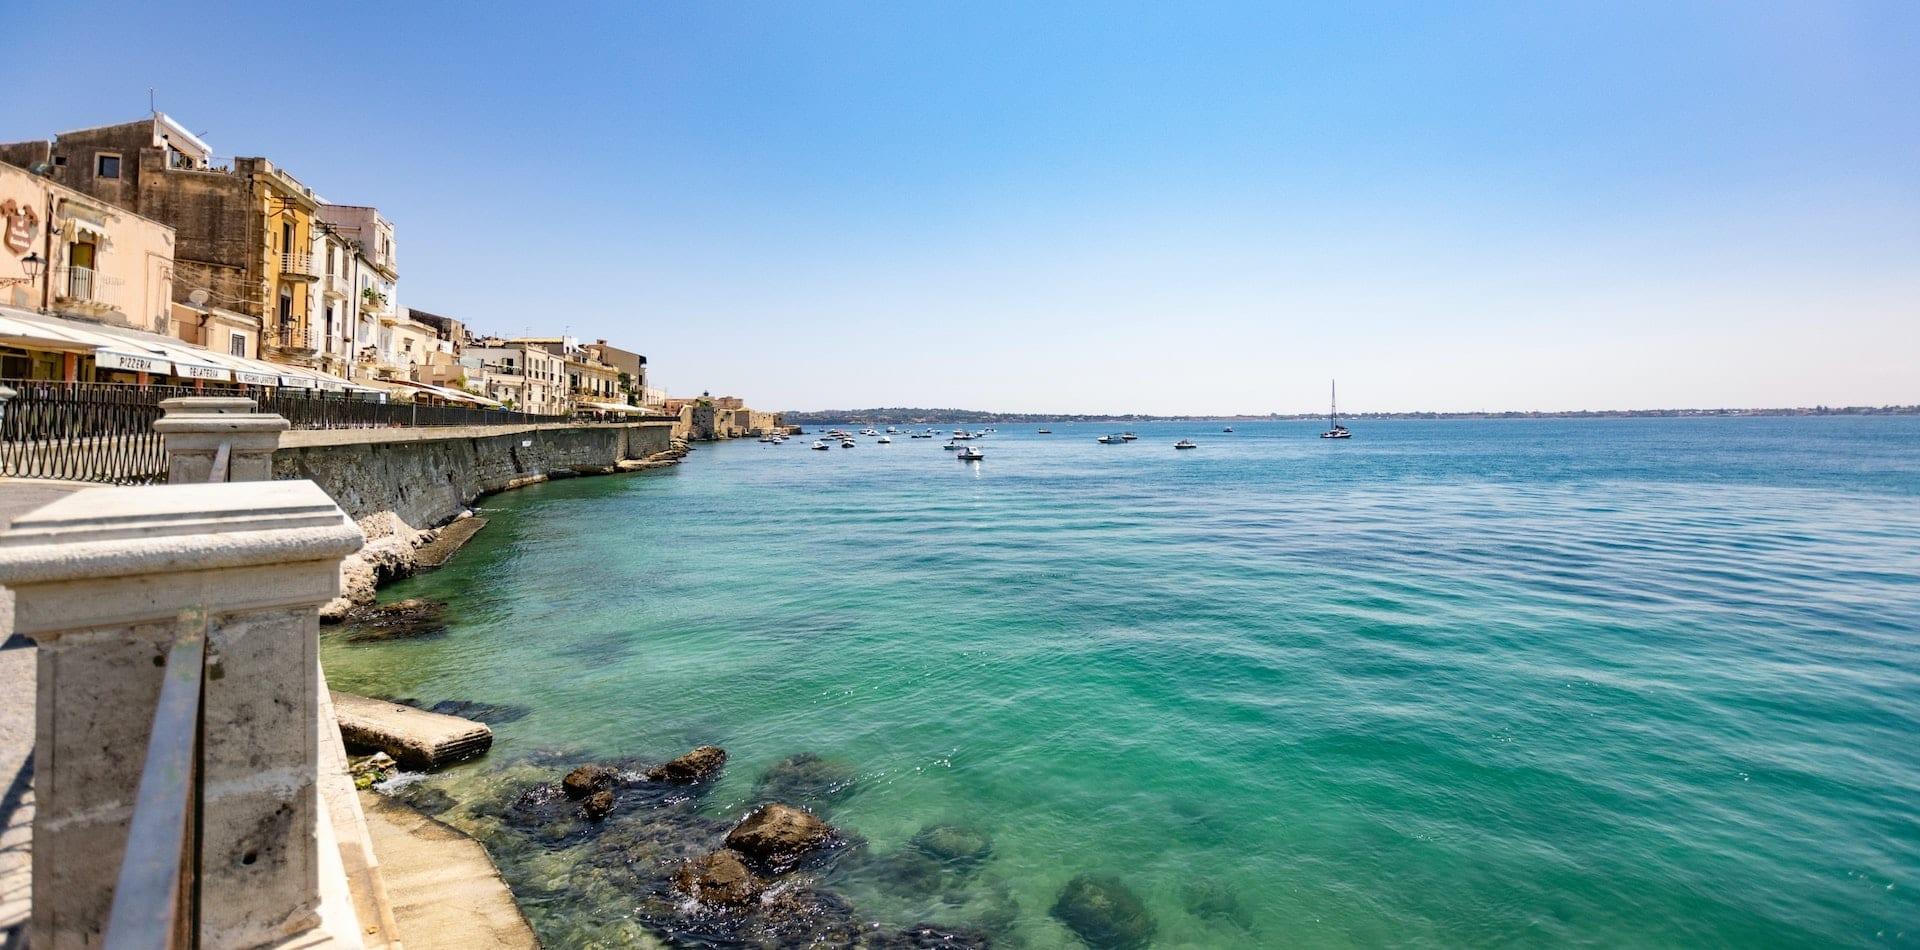 Hero imamge Syracuse Coastline Ocean Sicily Italy